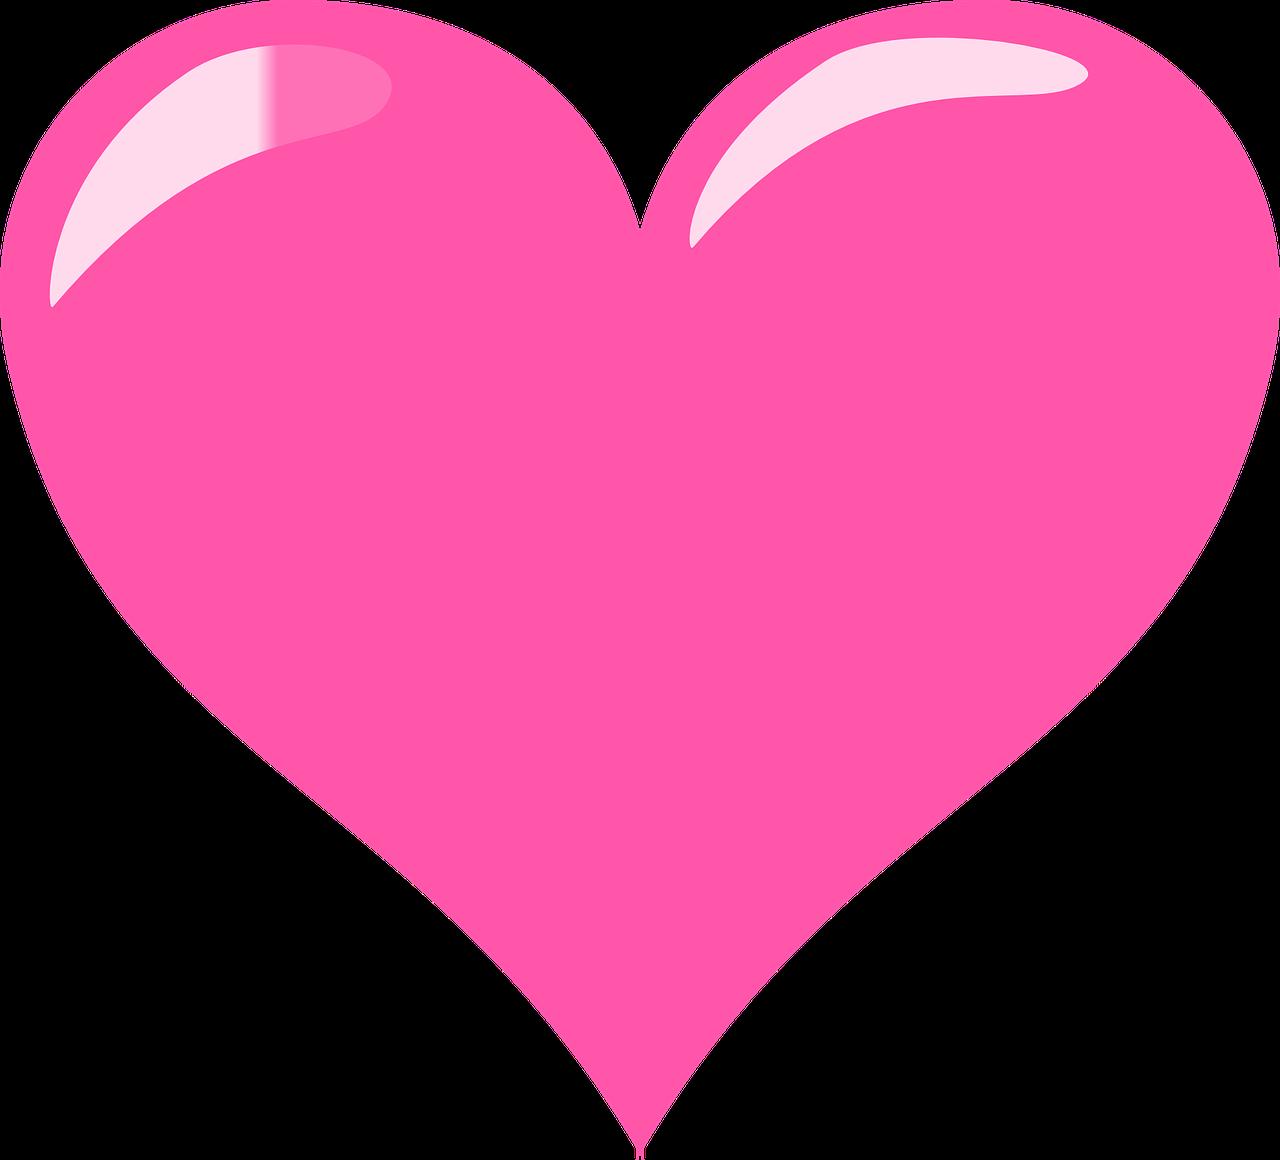 Hearts clipart lollipop.  heart free clipartable